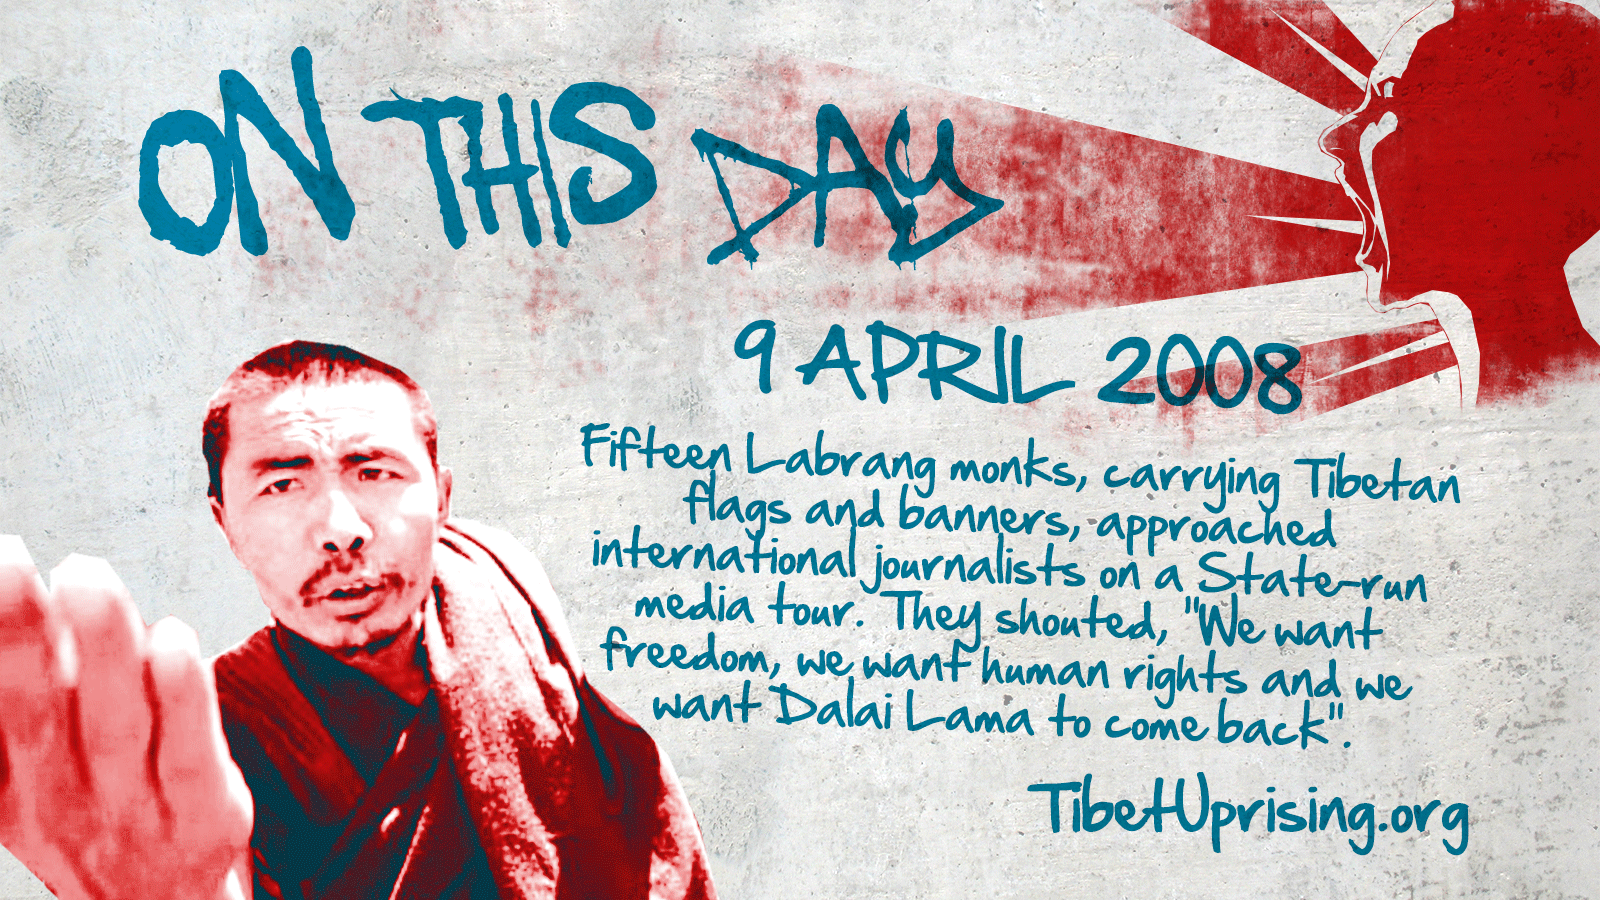 9 April 2008